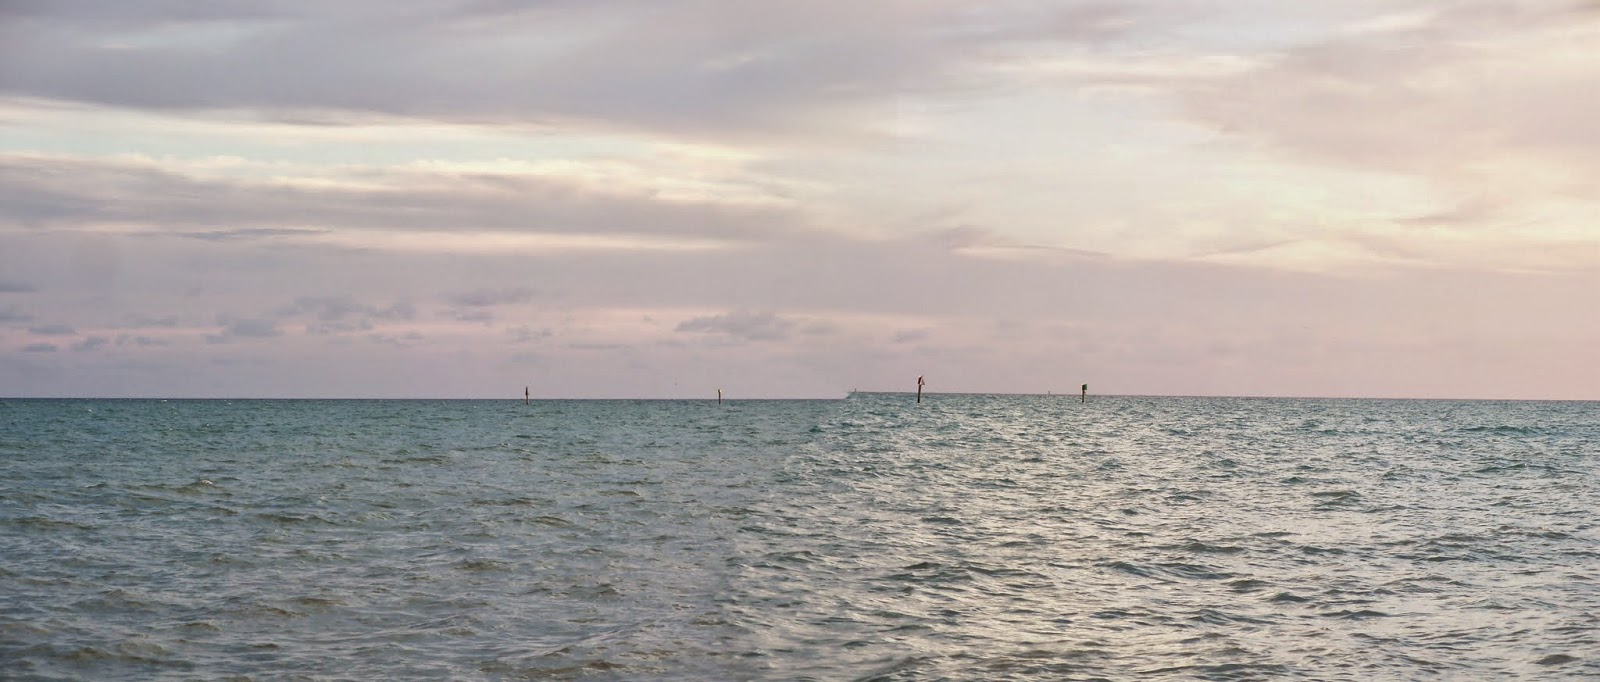 Key West Vacation - 116_5585.JPG